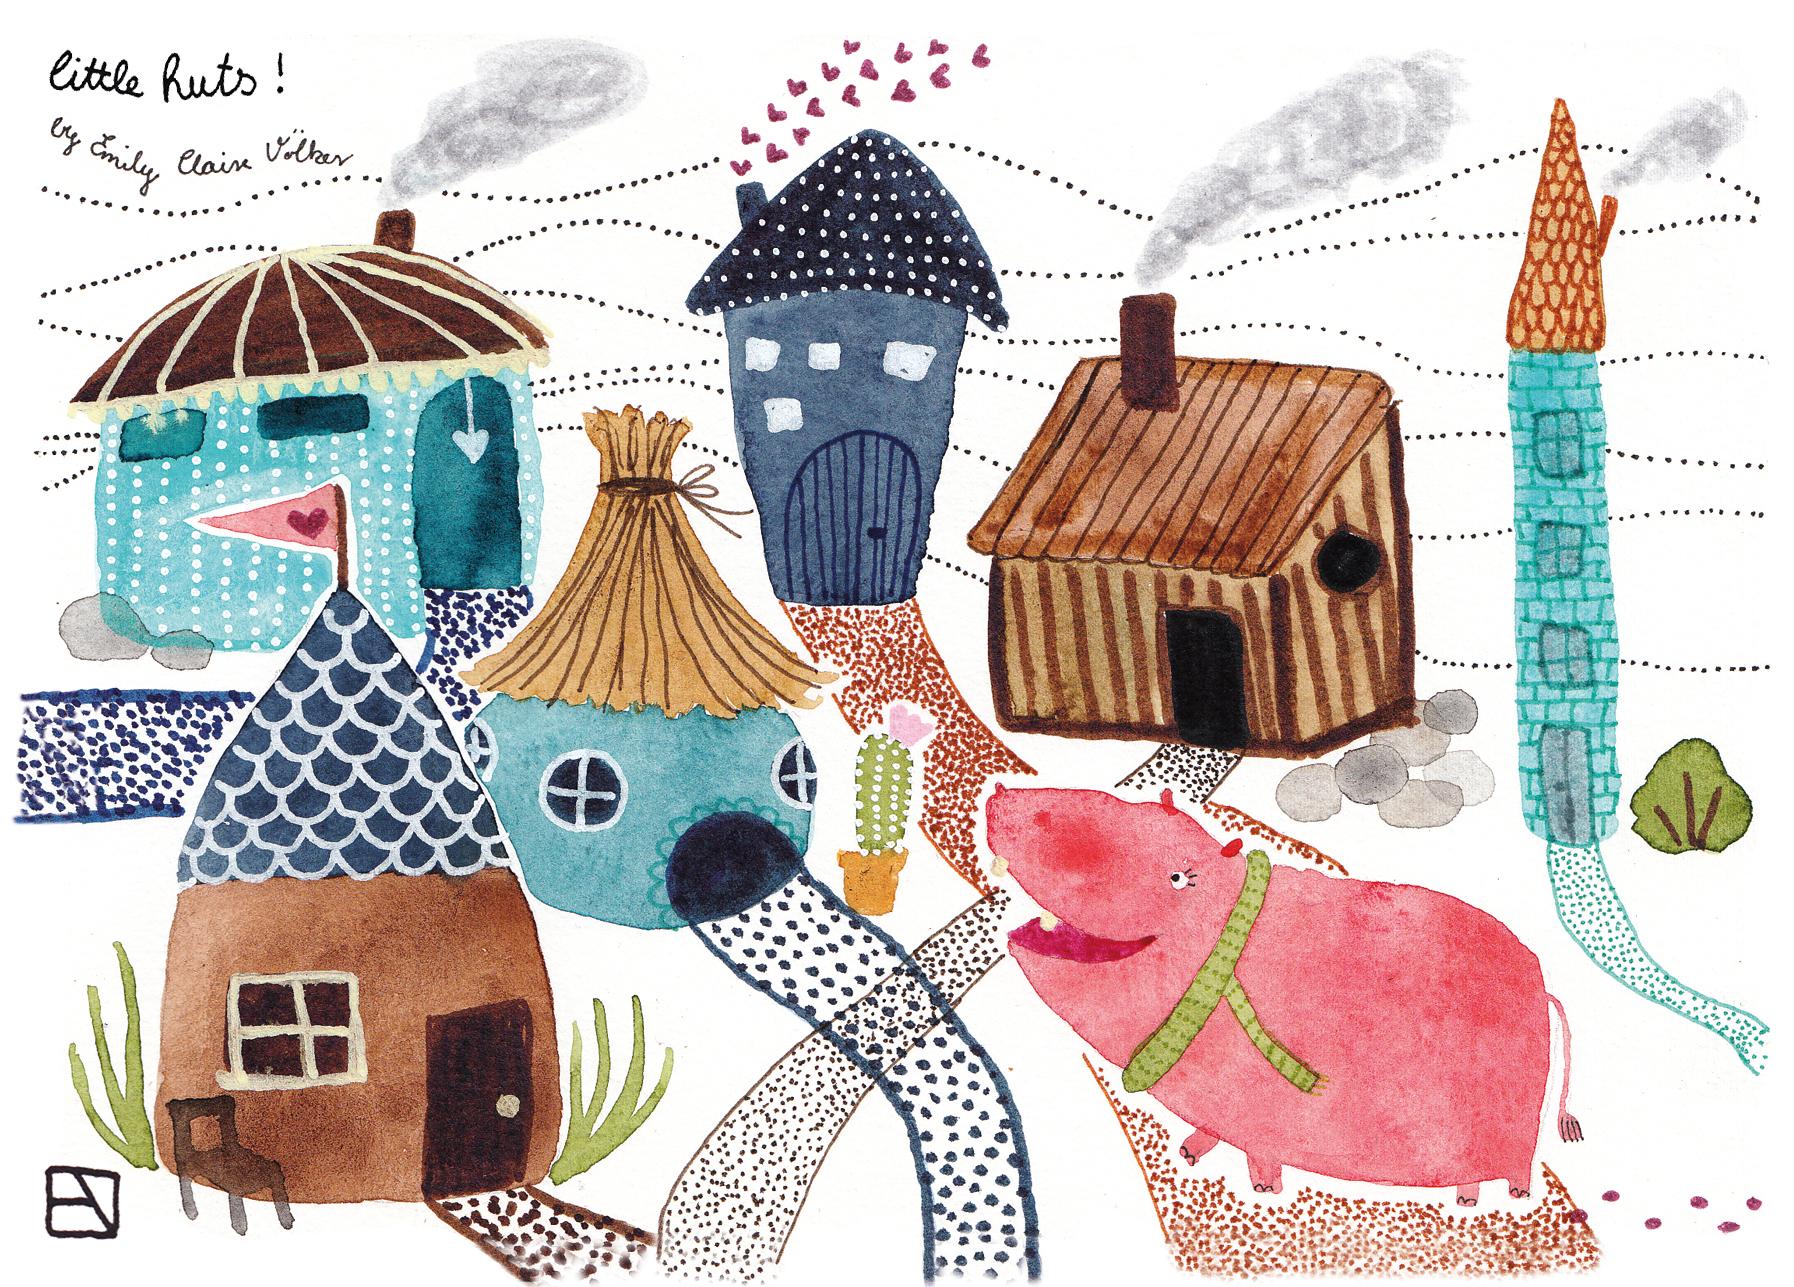 Henrietta discovers a village!